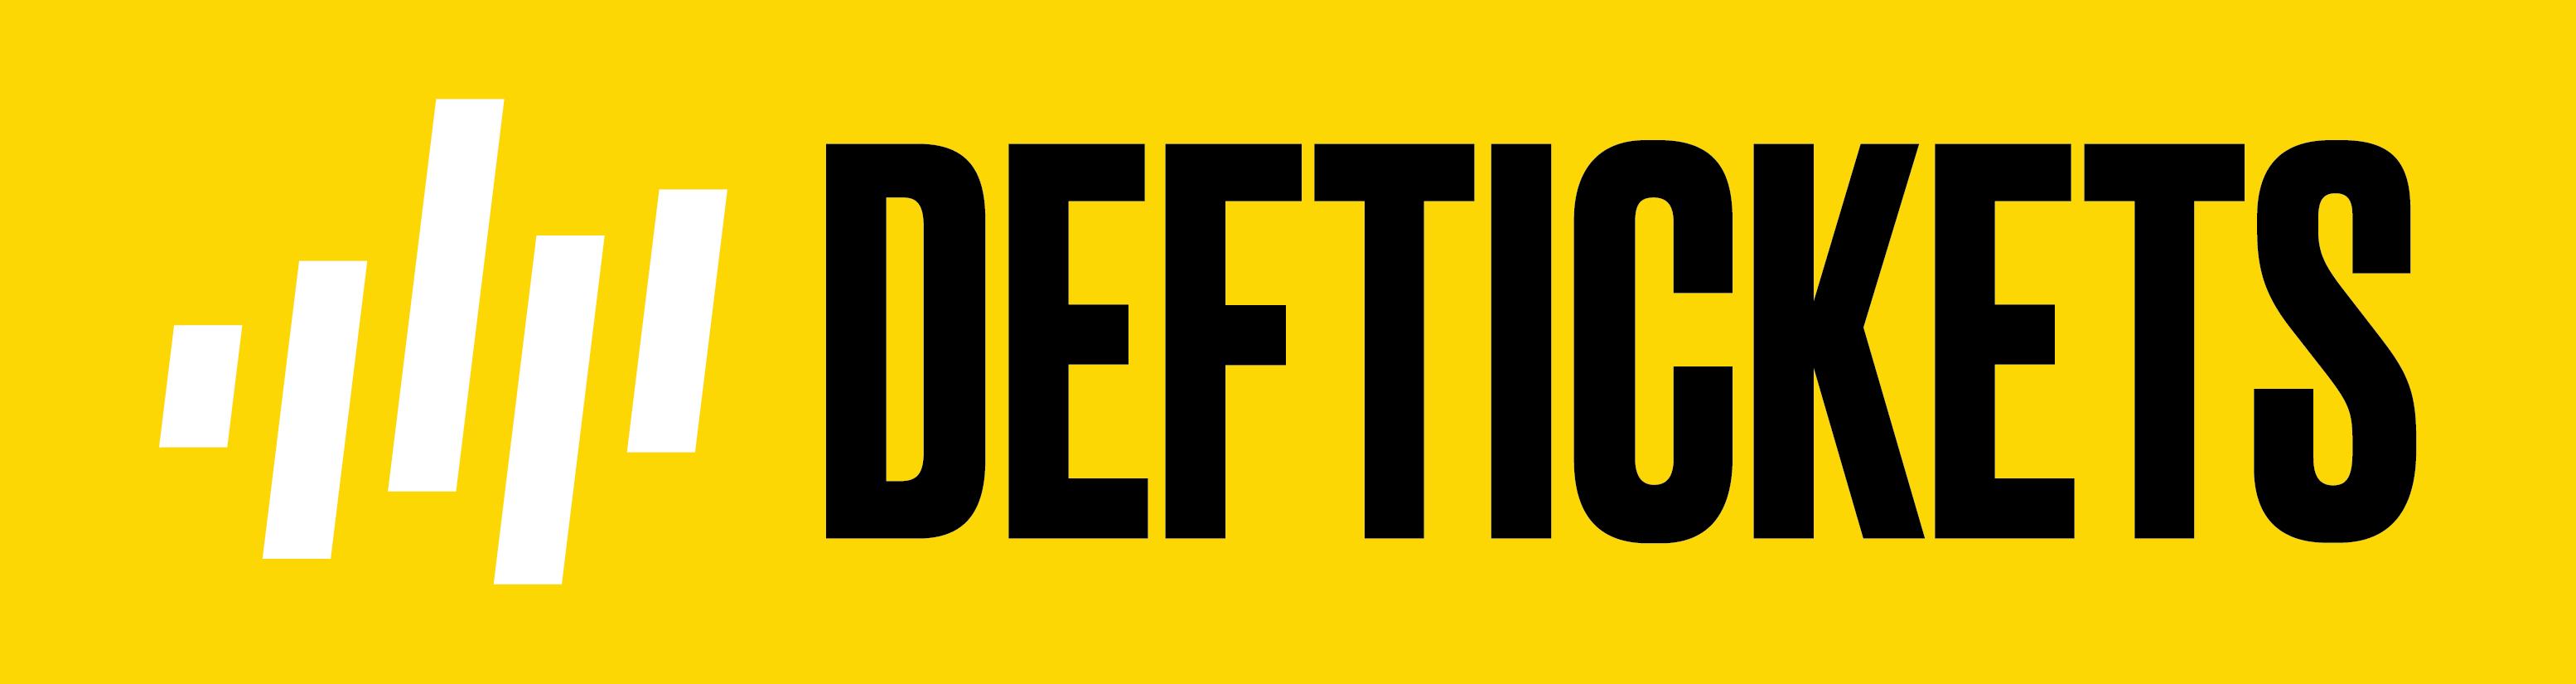 Deftickets Logo